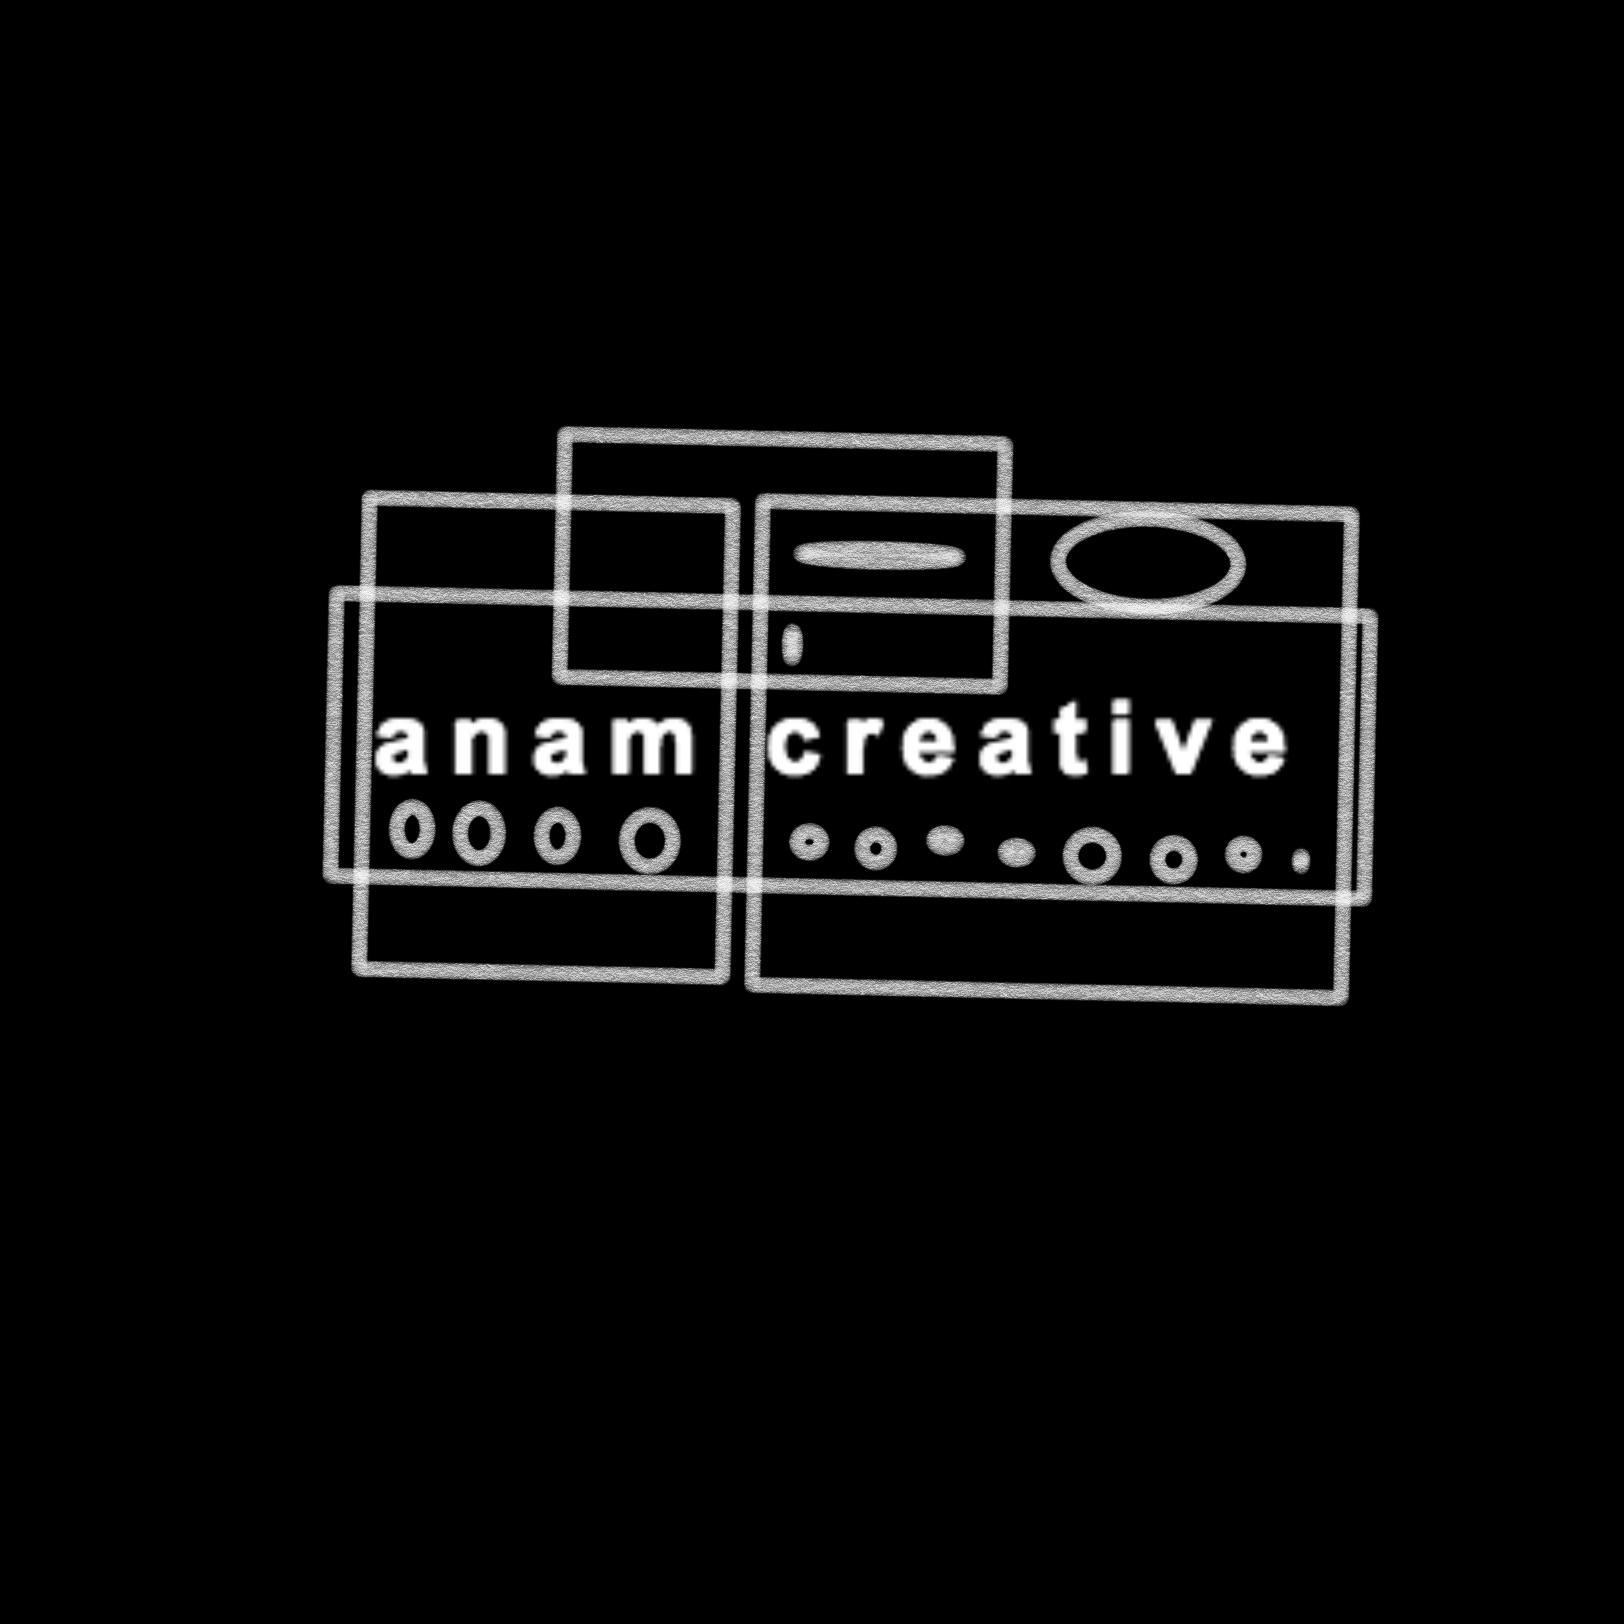 anam creative logo